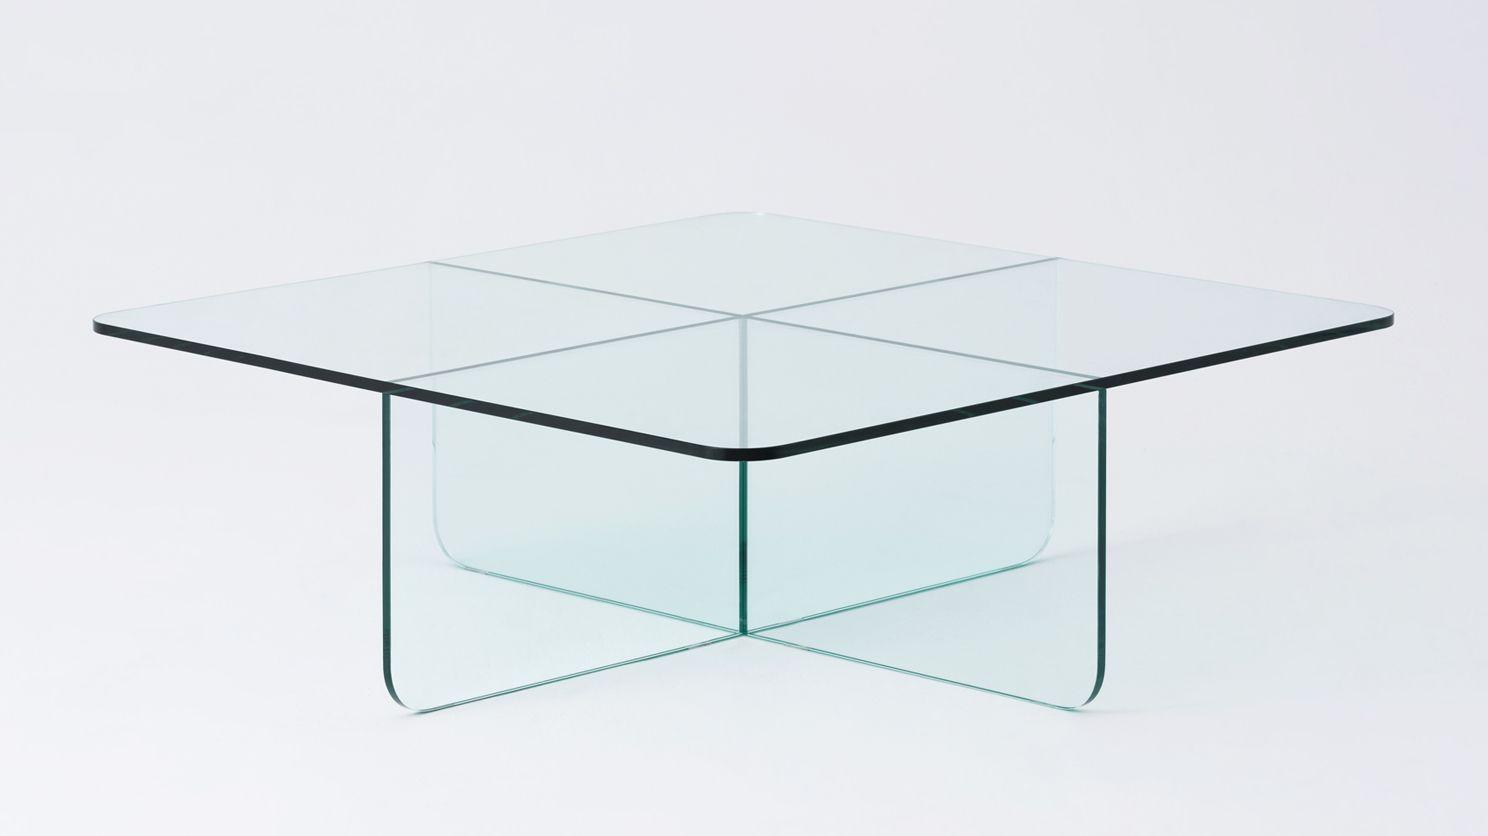 Verre Square Coffee Table Eq3 Coffee Table Coffee Table Square Square Glass Coffee Table [ 836 x 1488 Pixel ]